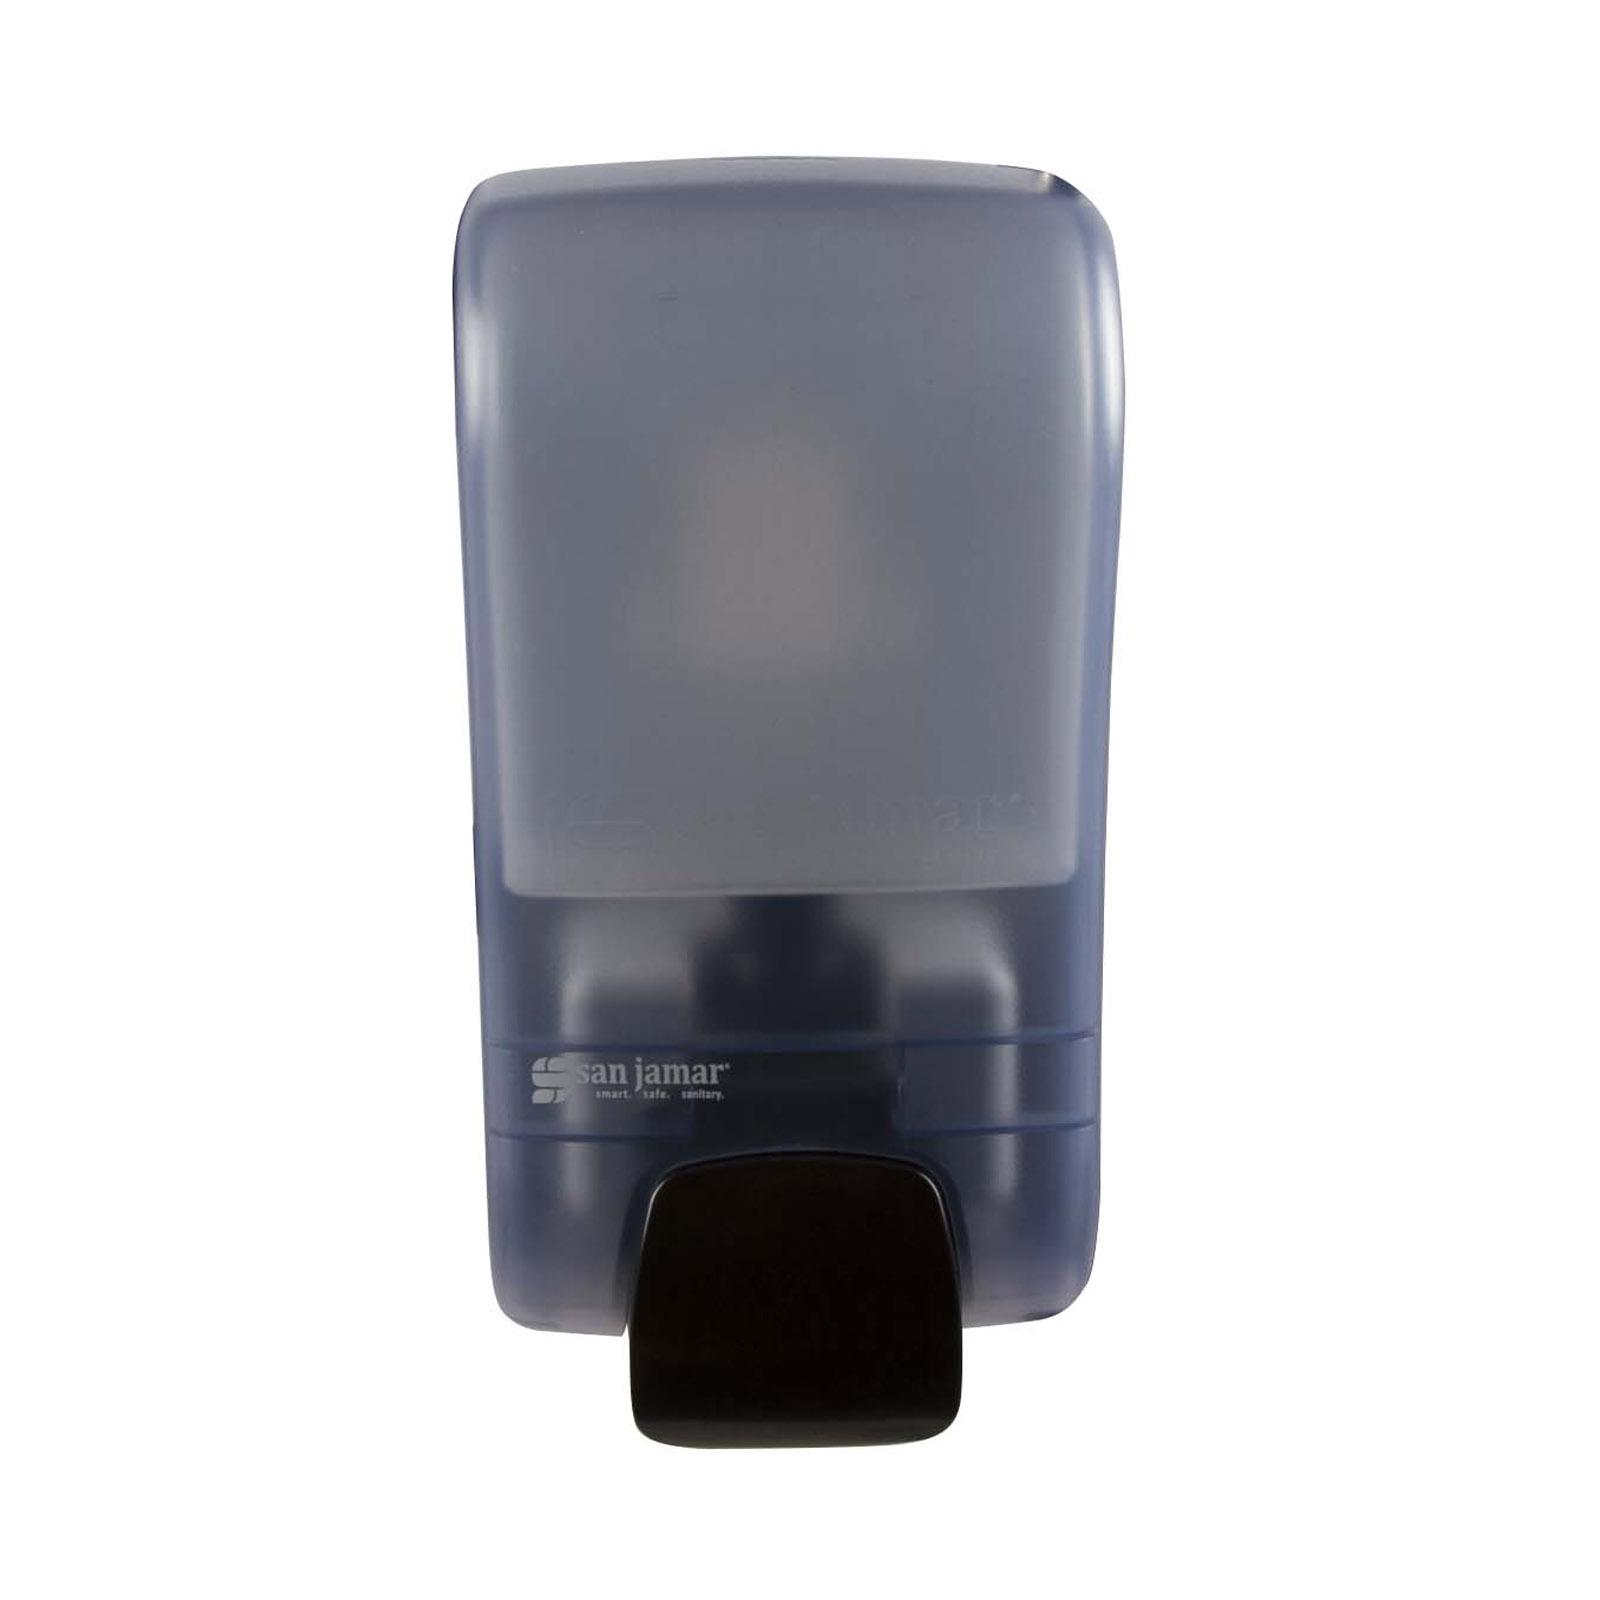 San Jamar S1300TBL hand soap / sanitizer dispenser